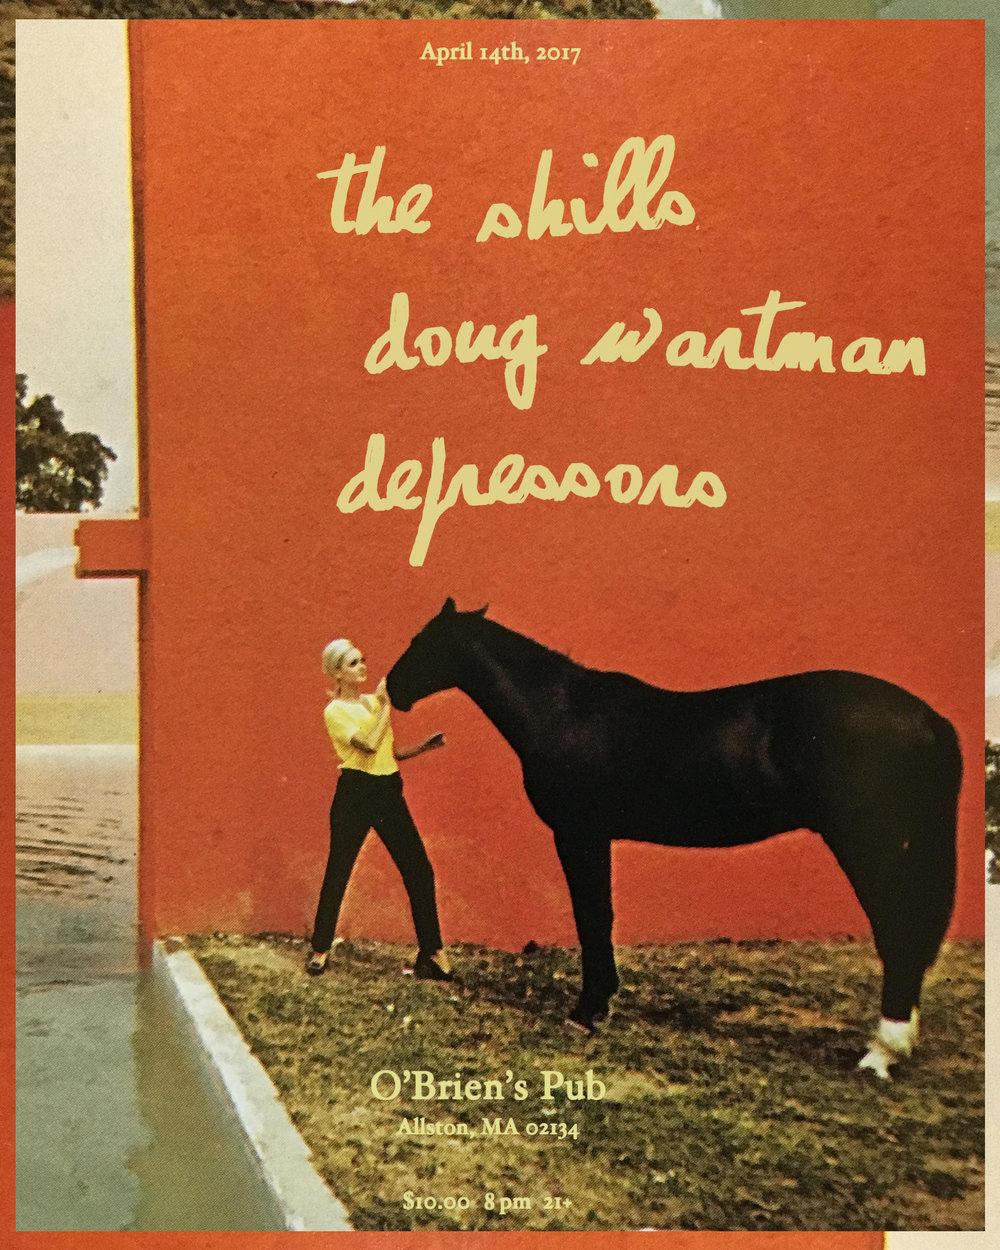 Flyer-TheShills414-Horse copy.jpg